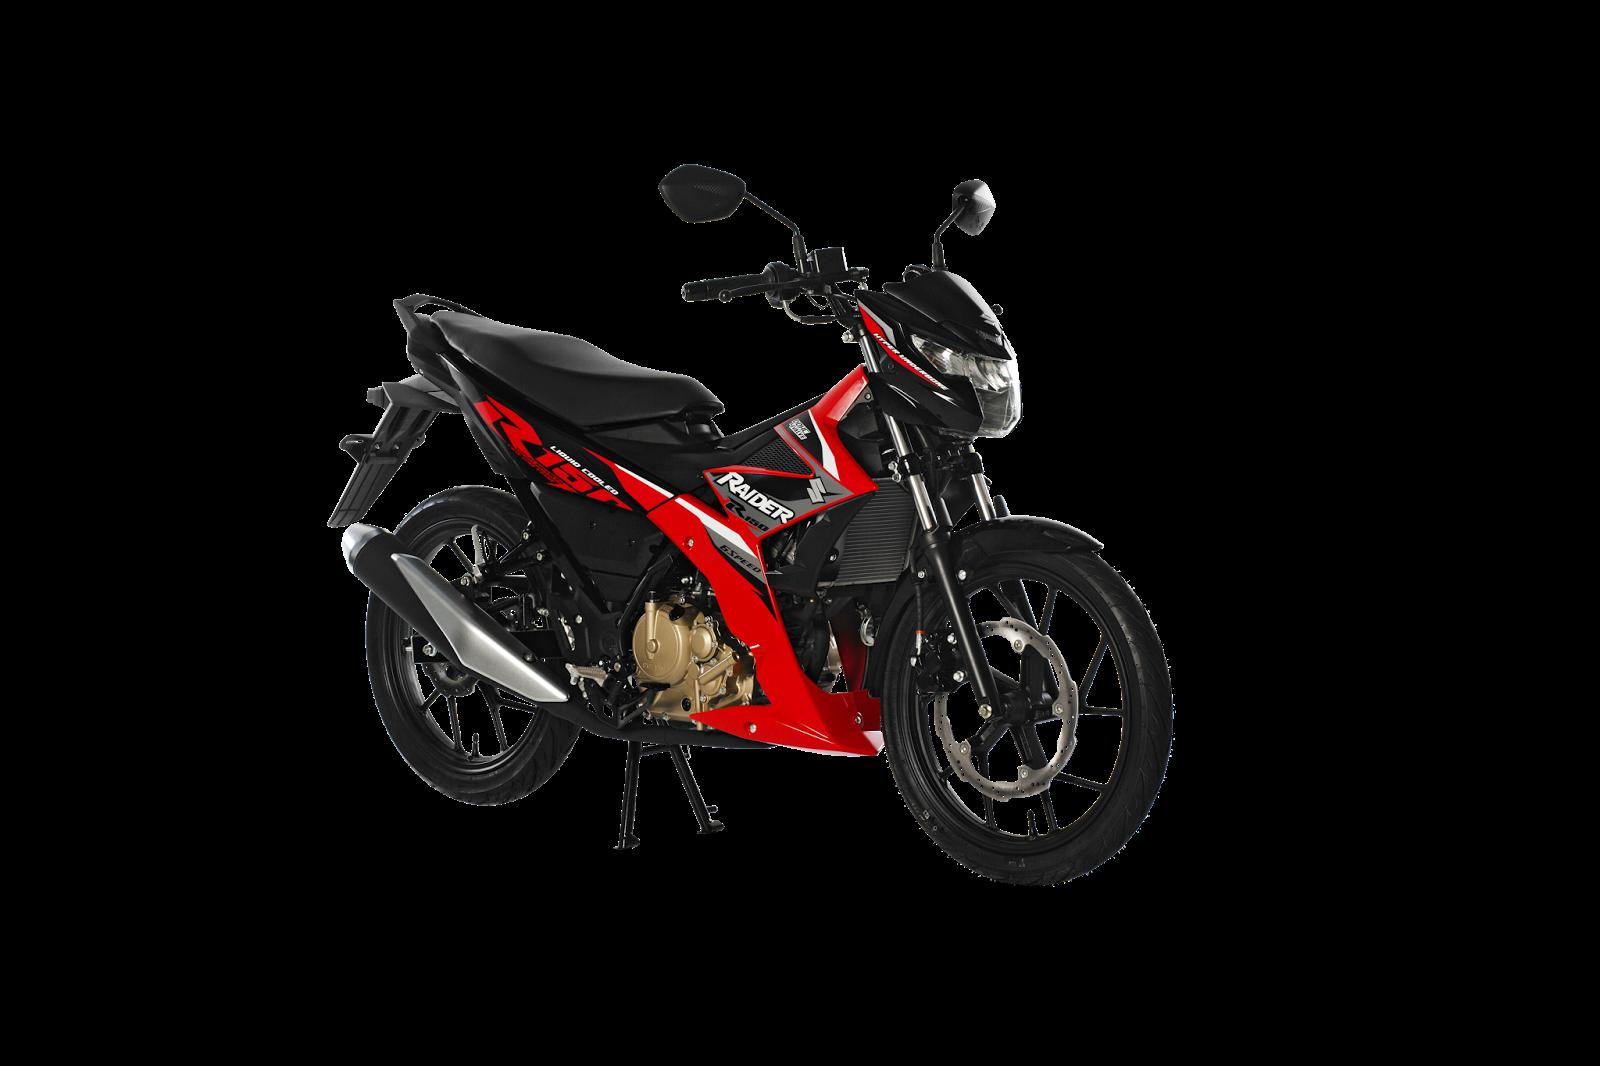 Suzuki Raider R150 fi – Full Specifications and Price | Motoph